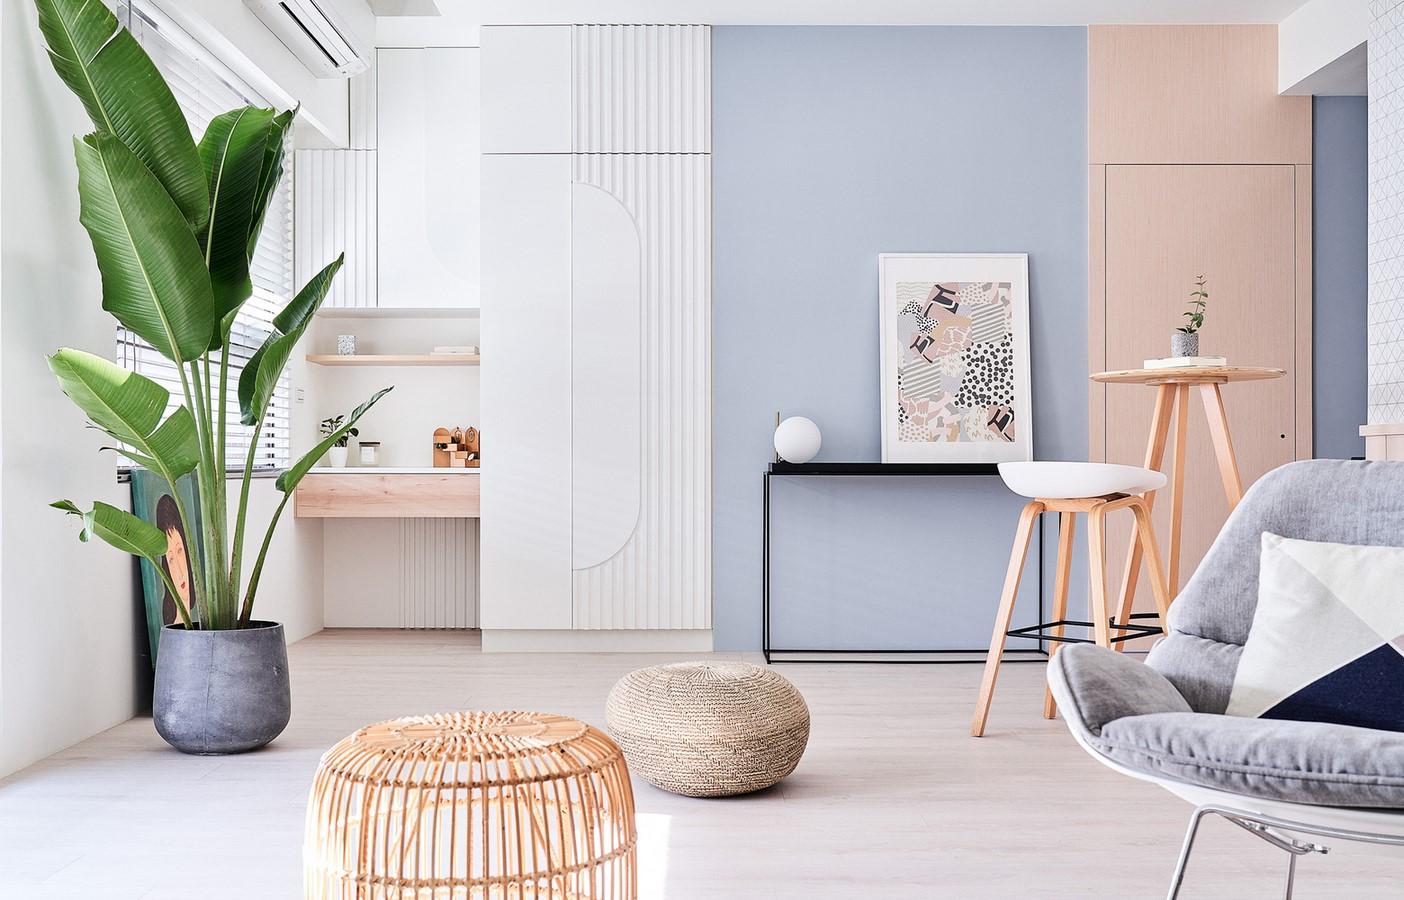 10 beginner level courses in interior design - Sheet1